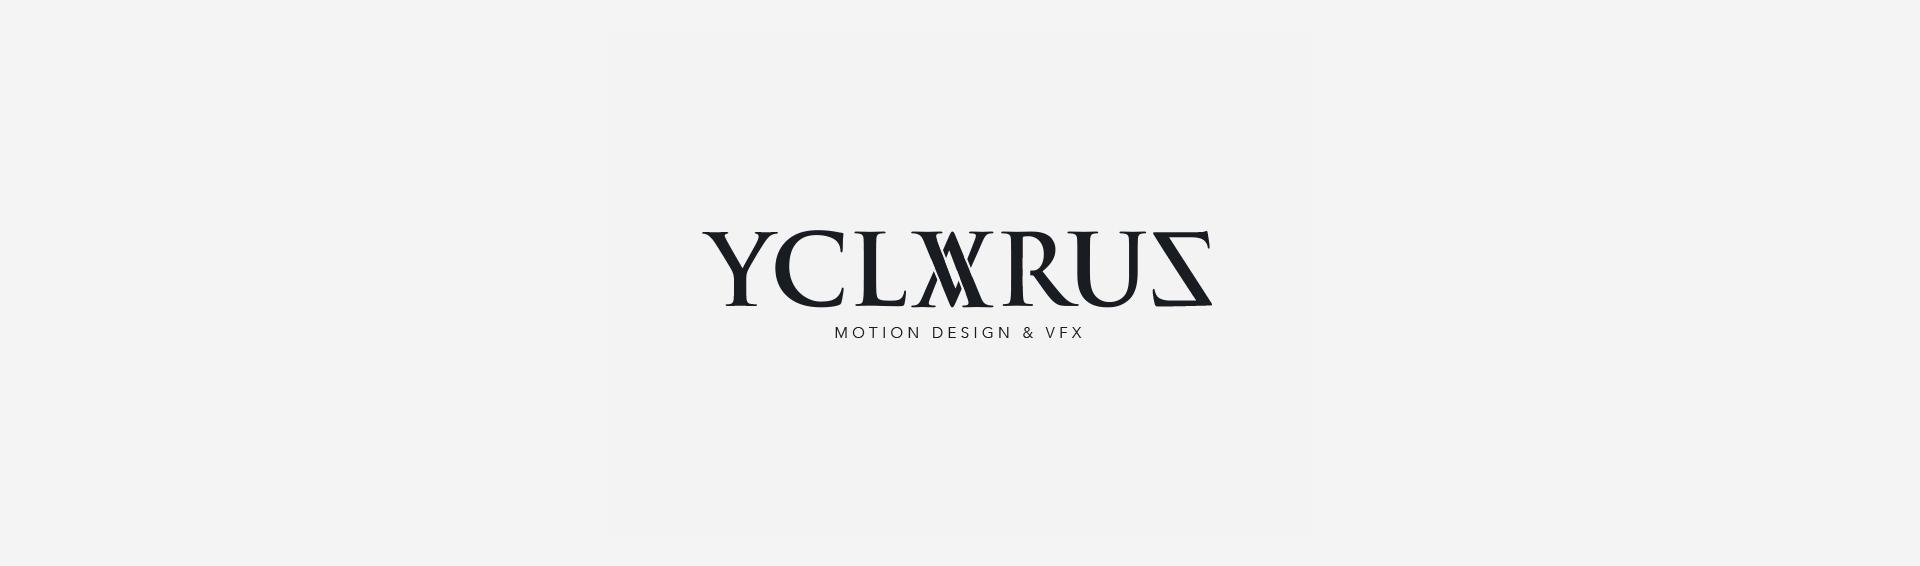 yclarus_logotype_identity_corporate_b